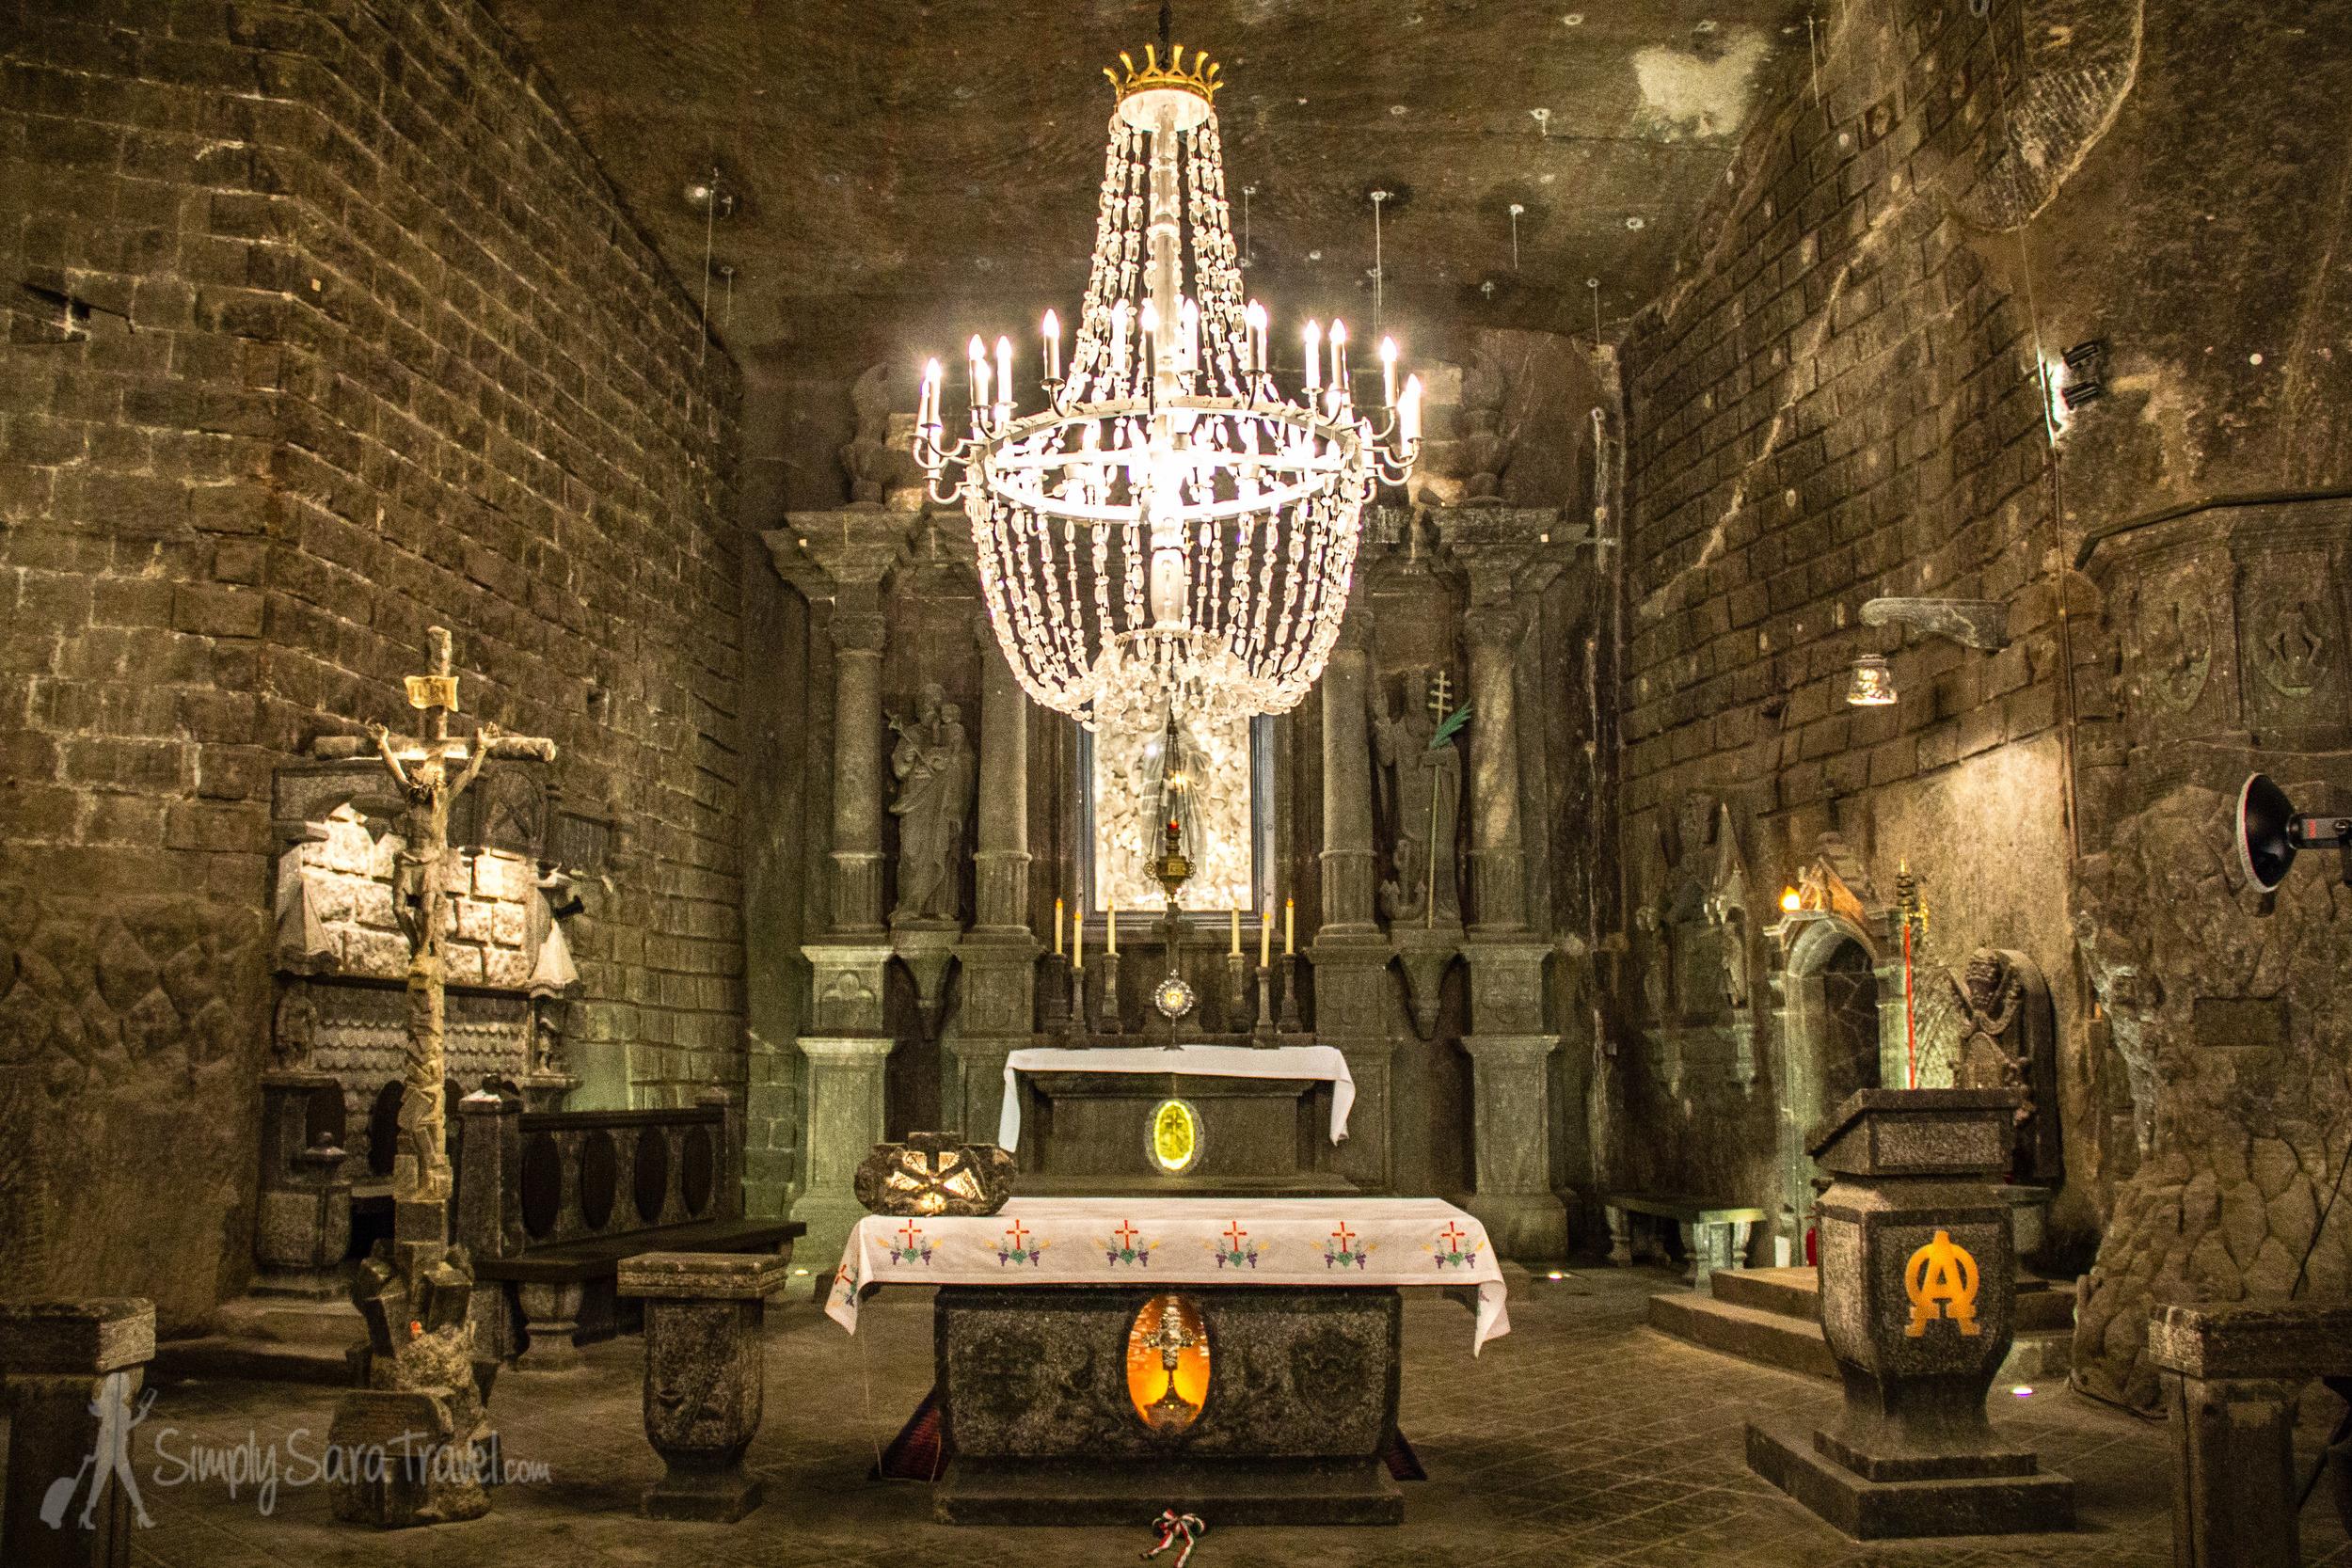 101 meters underground lies this wonder - the St. Kinga Chapel